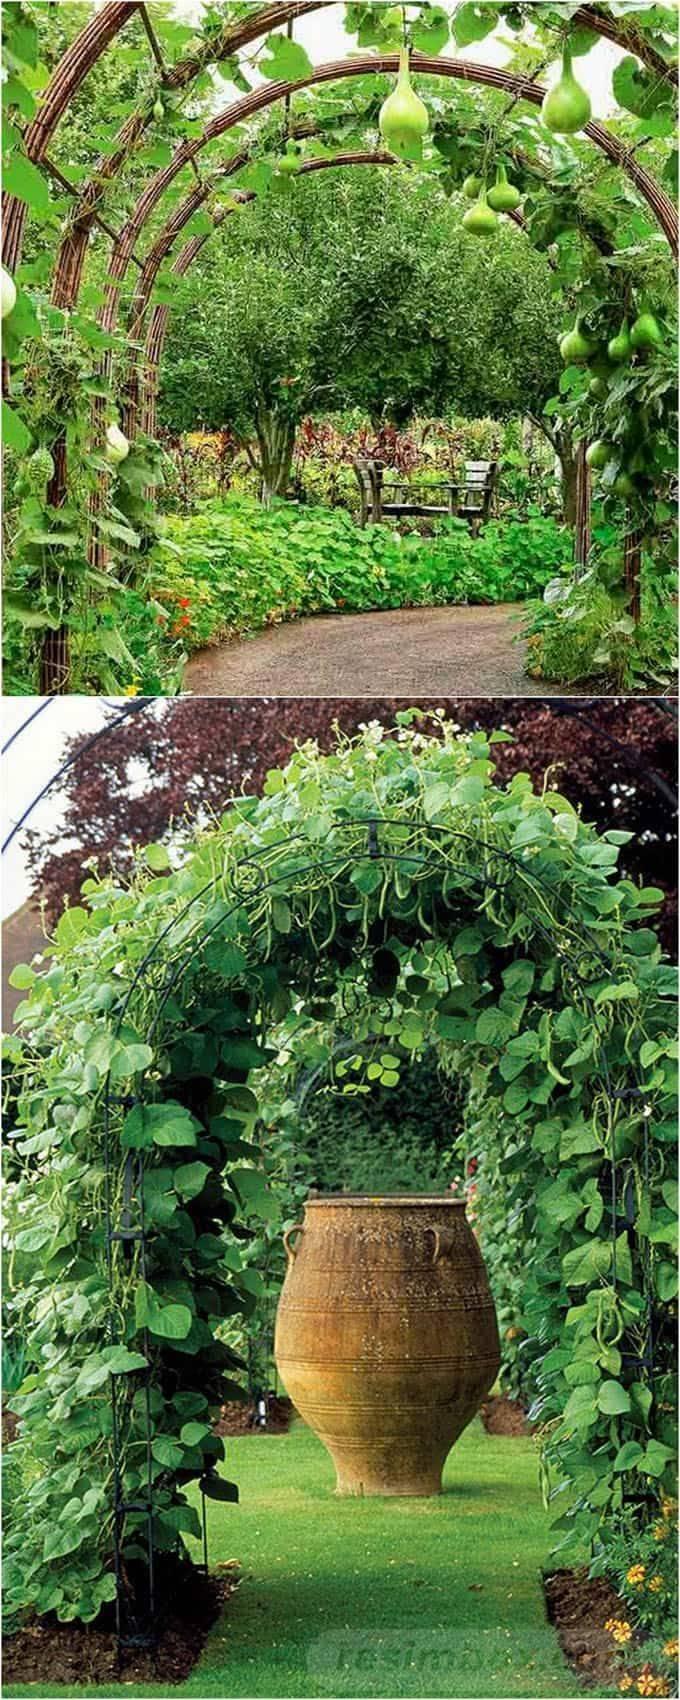 diy garden easy-596656650603795136